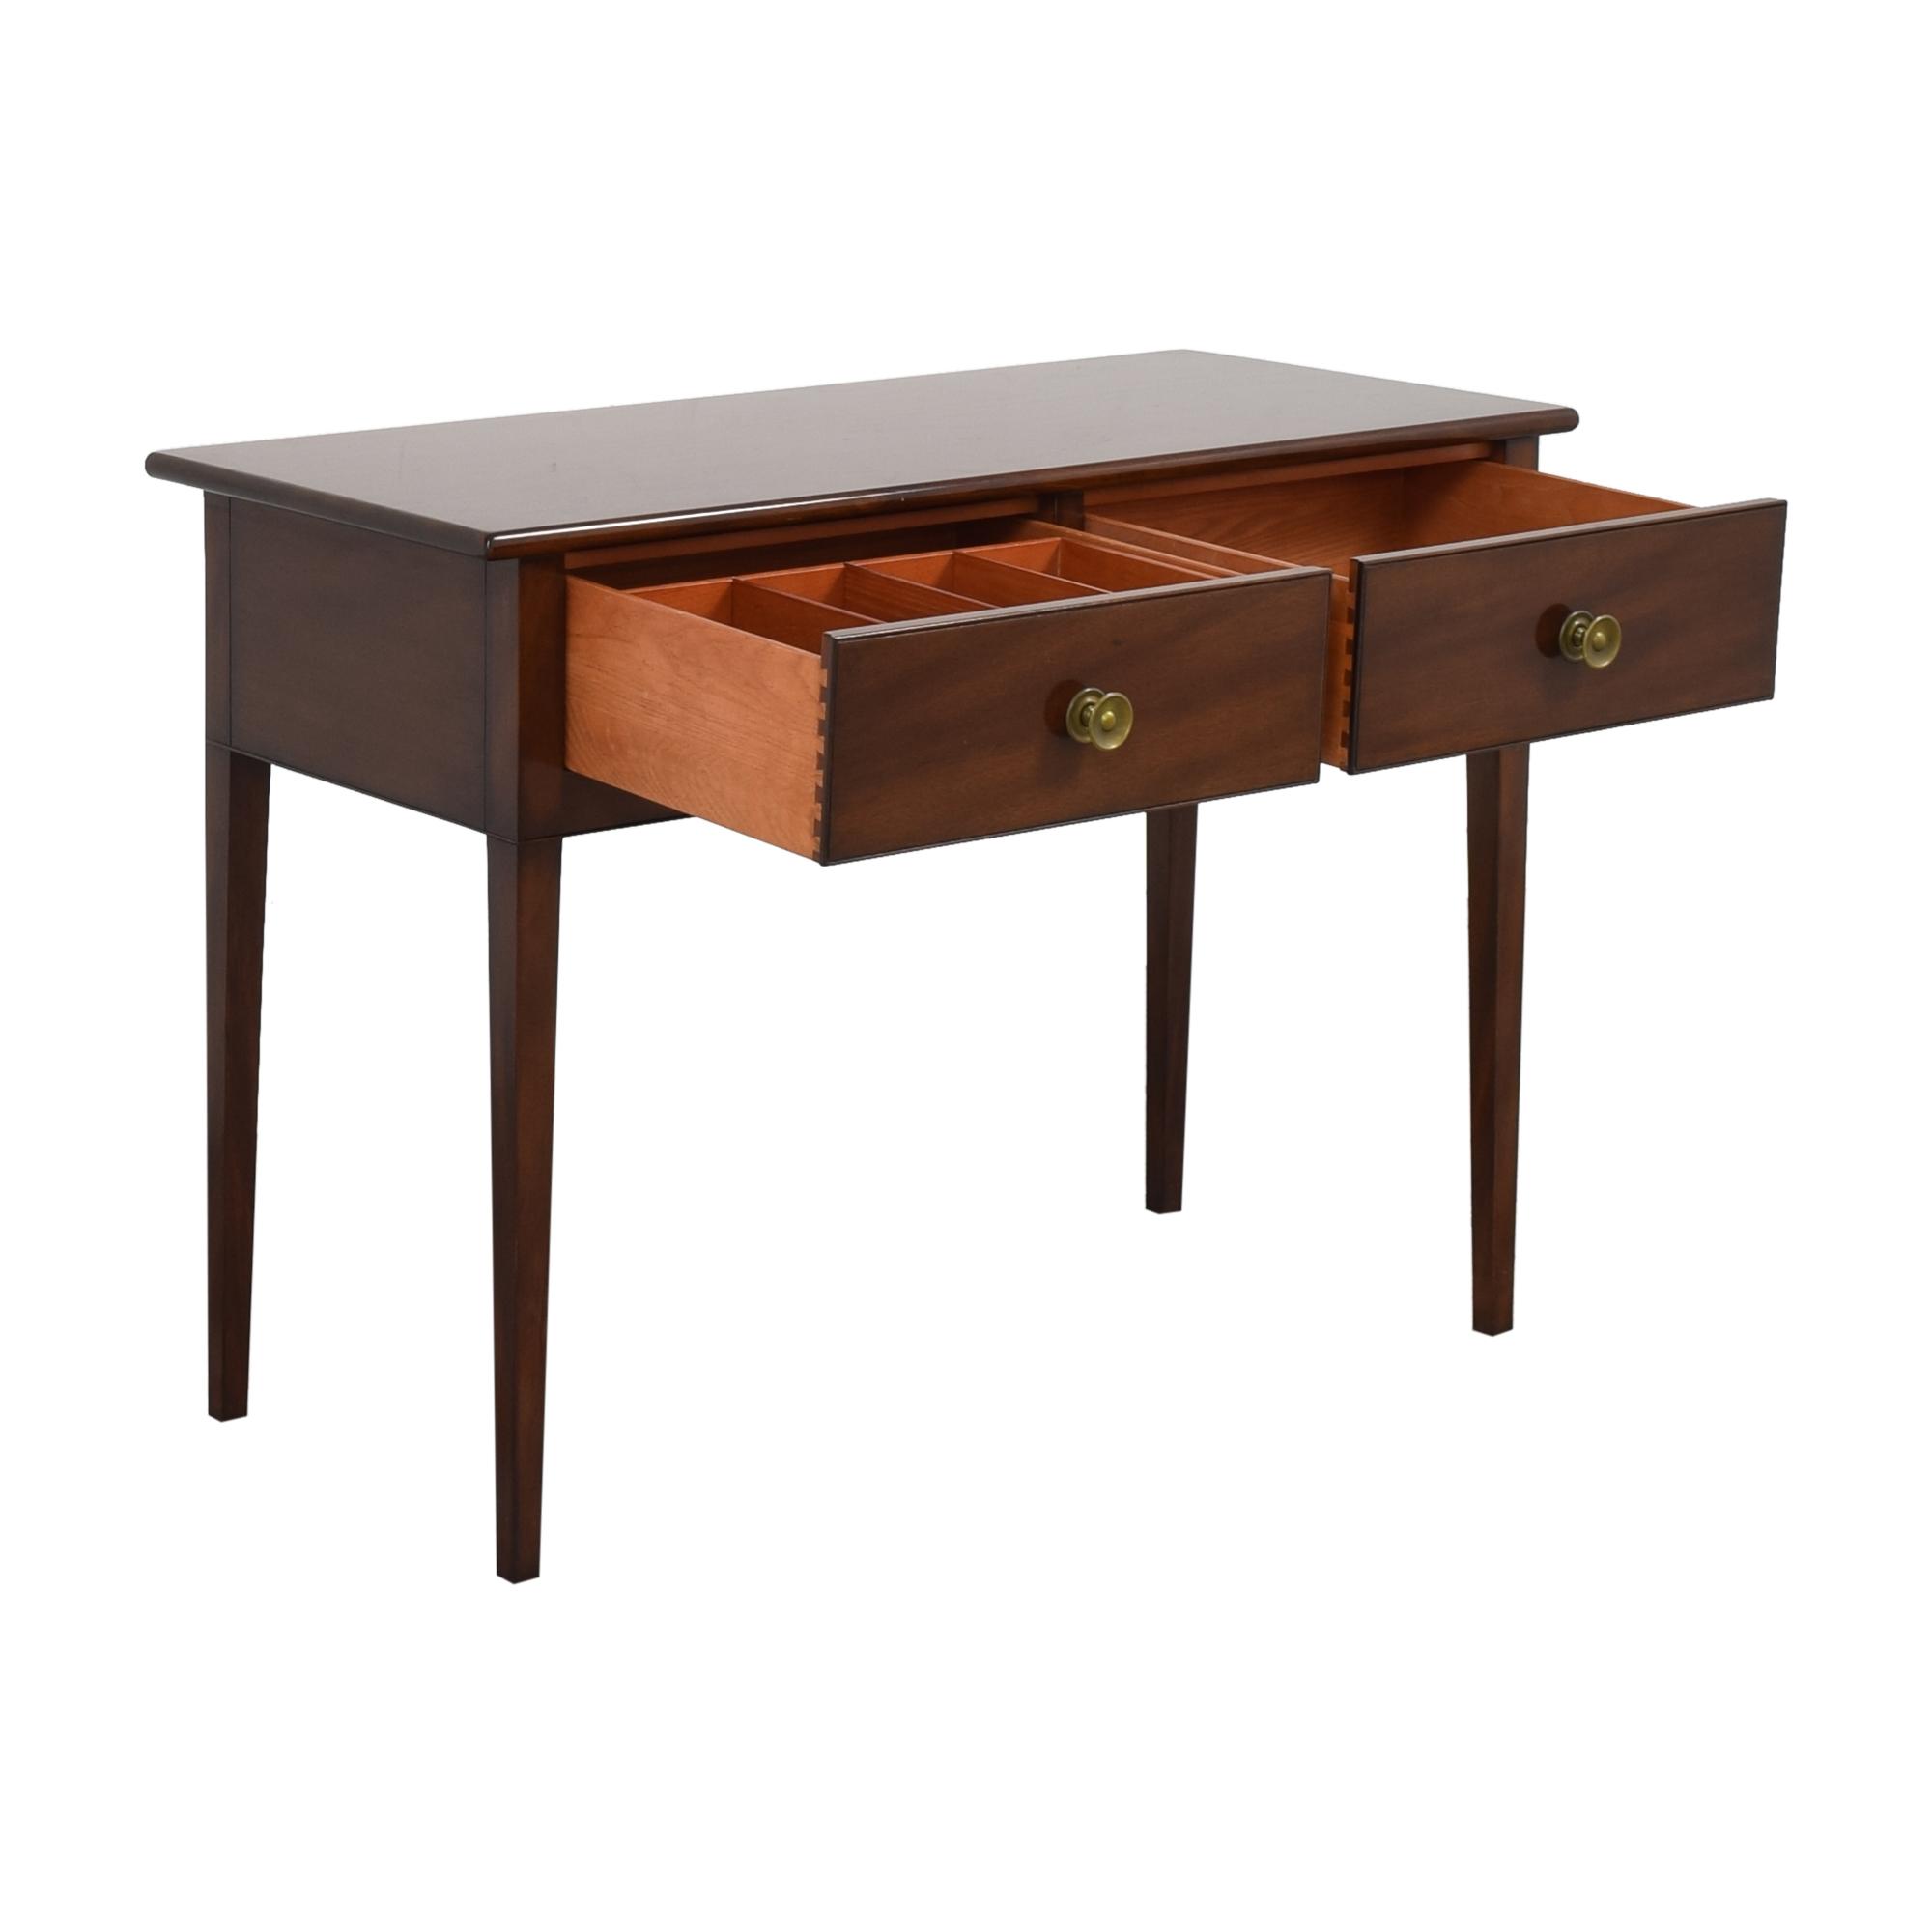 Kittinger Furniture Kittinger Furniture Console Table on sale